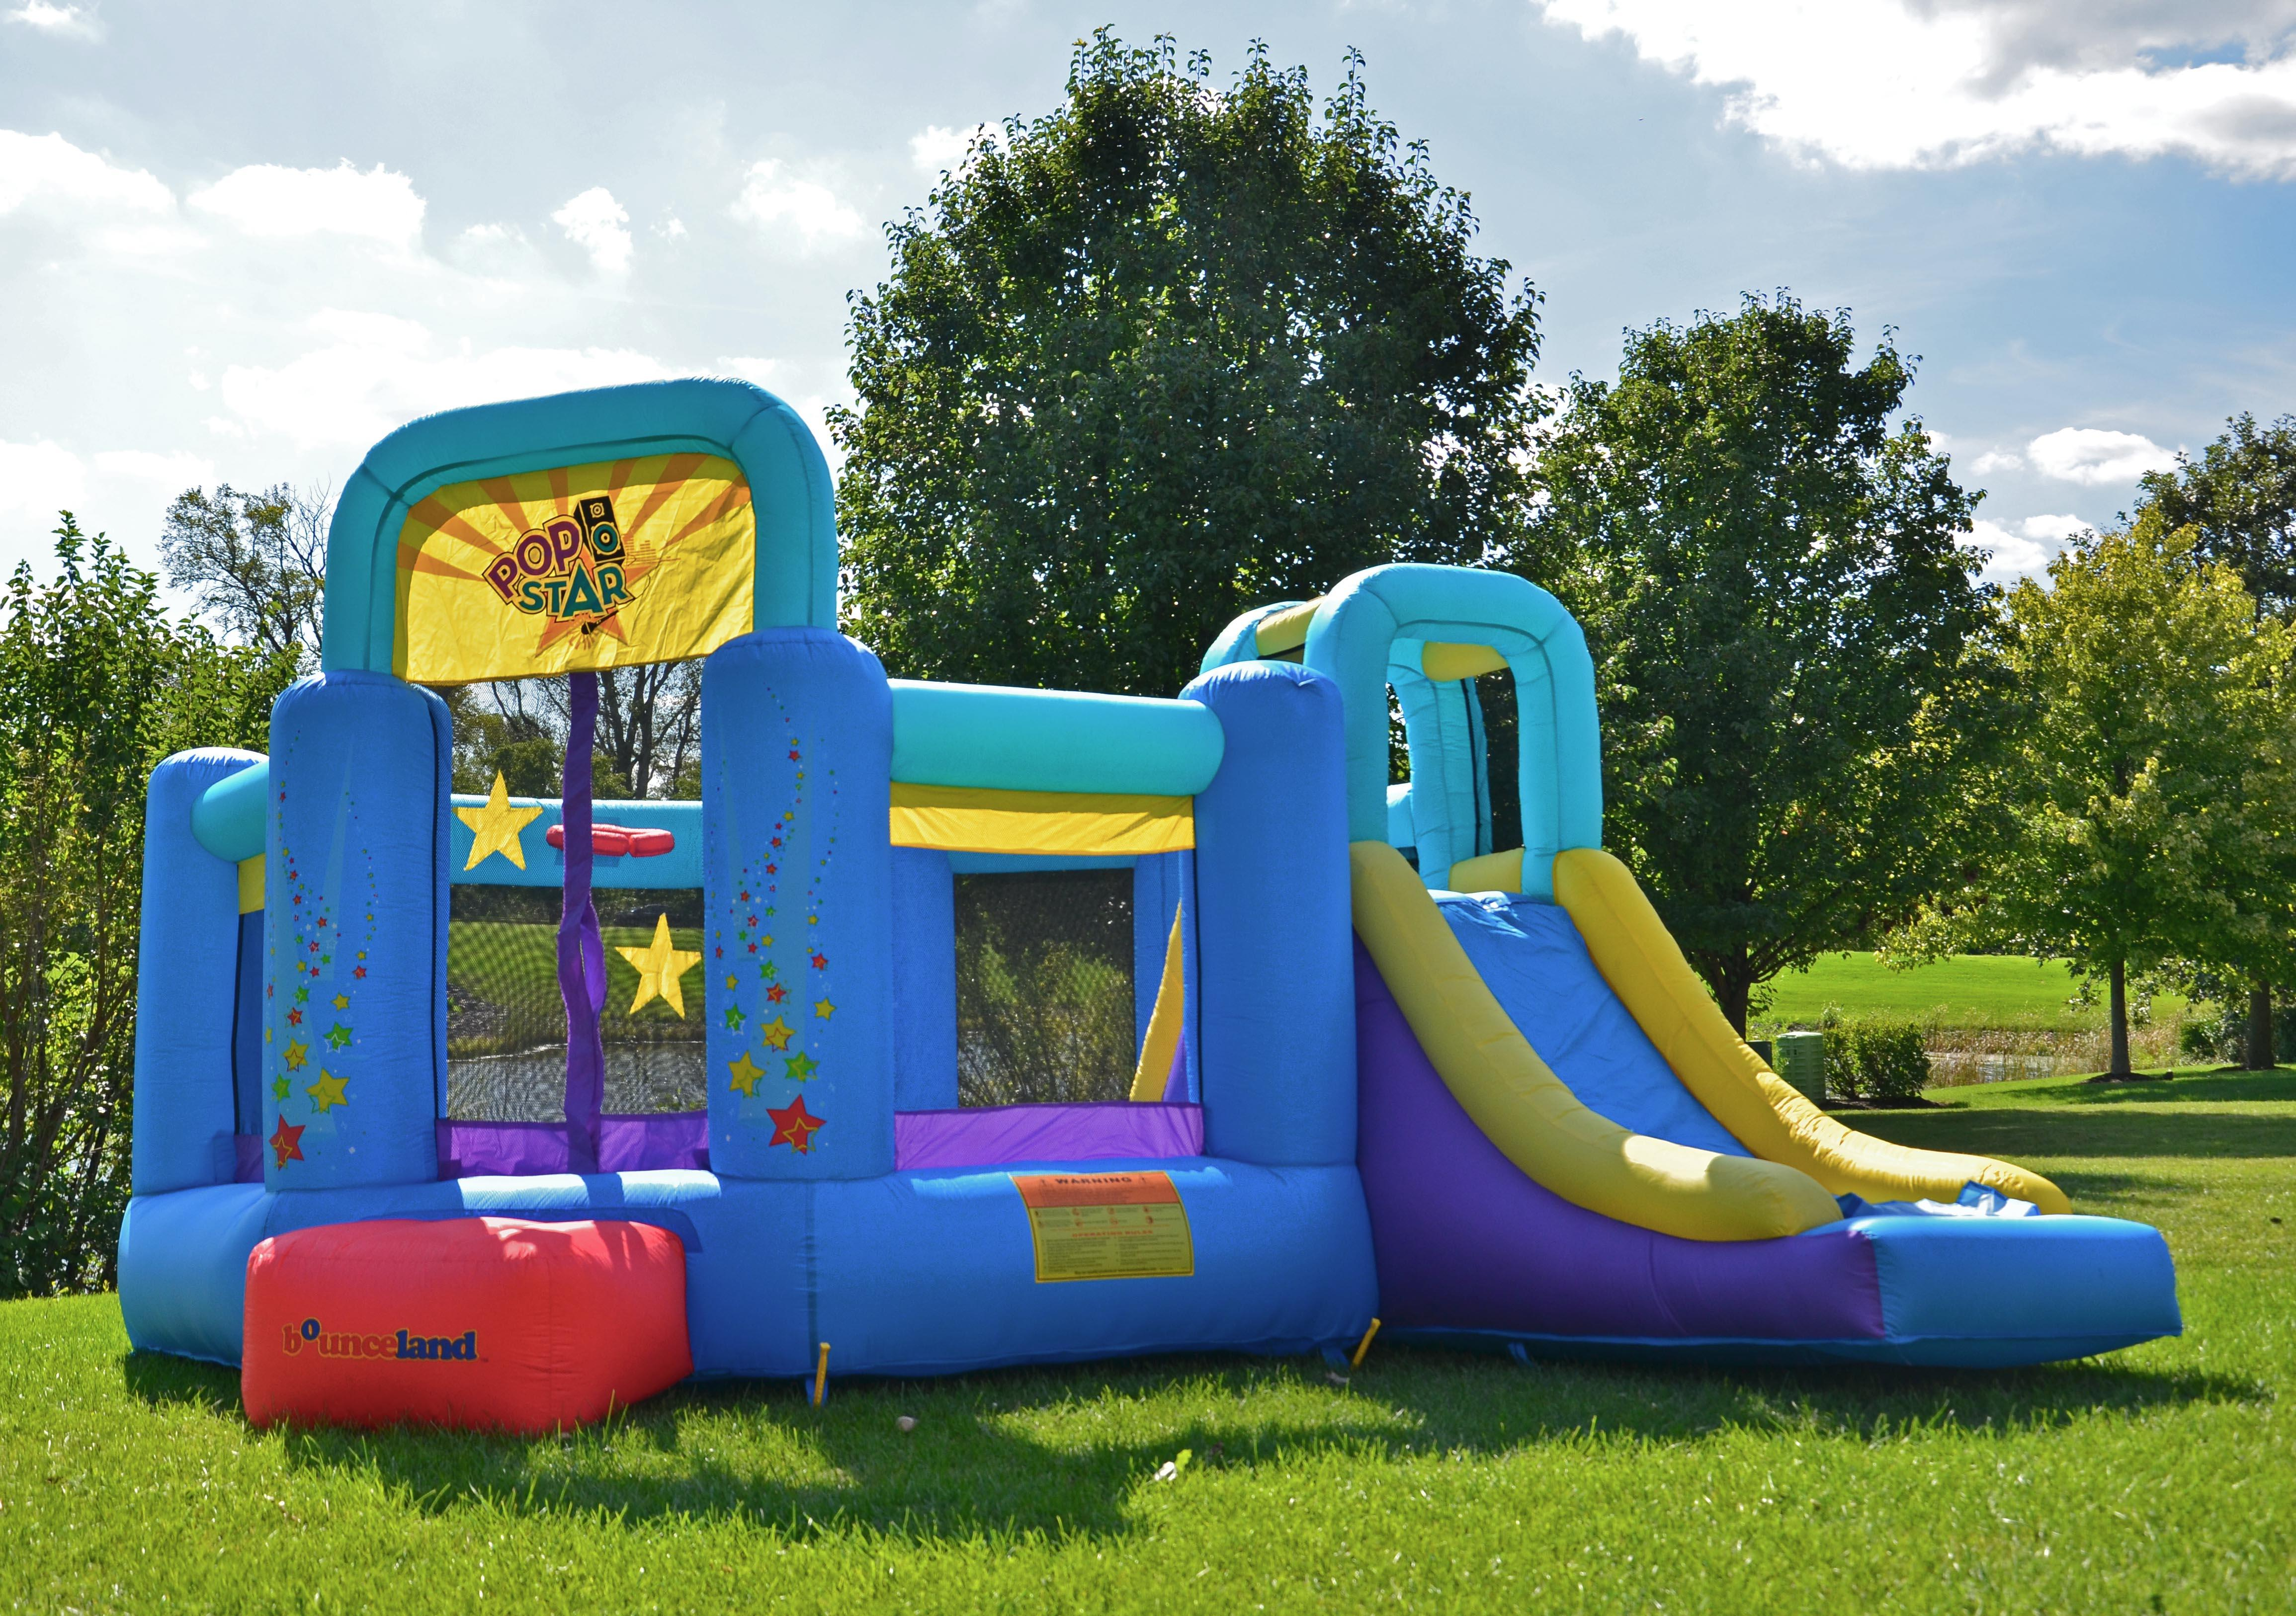 Amazon.com: Castillo hinchable Bounceland Pop Star.: Toys ...